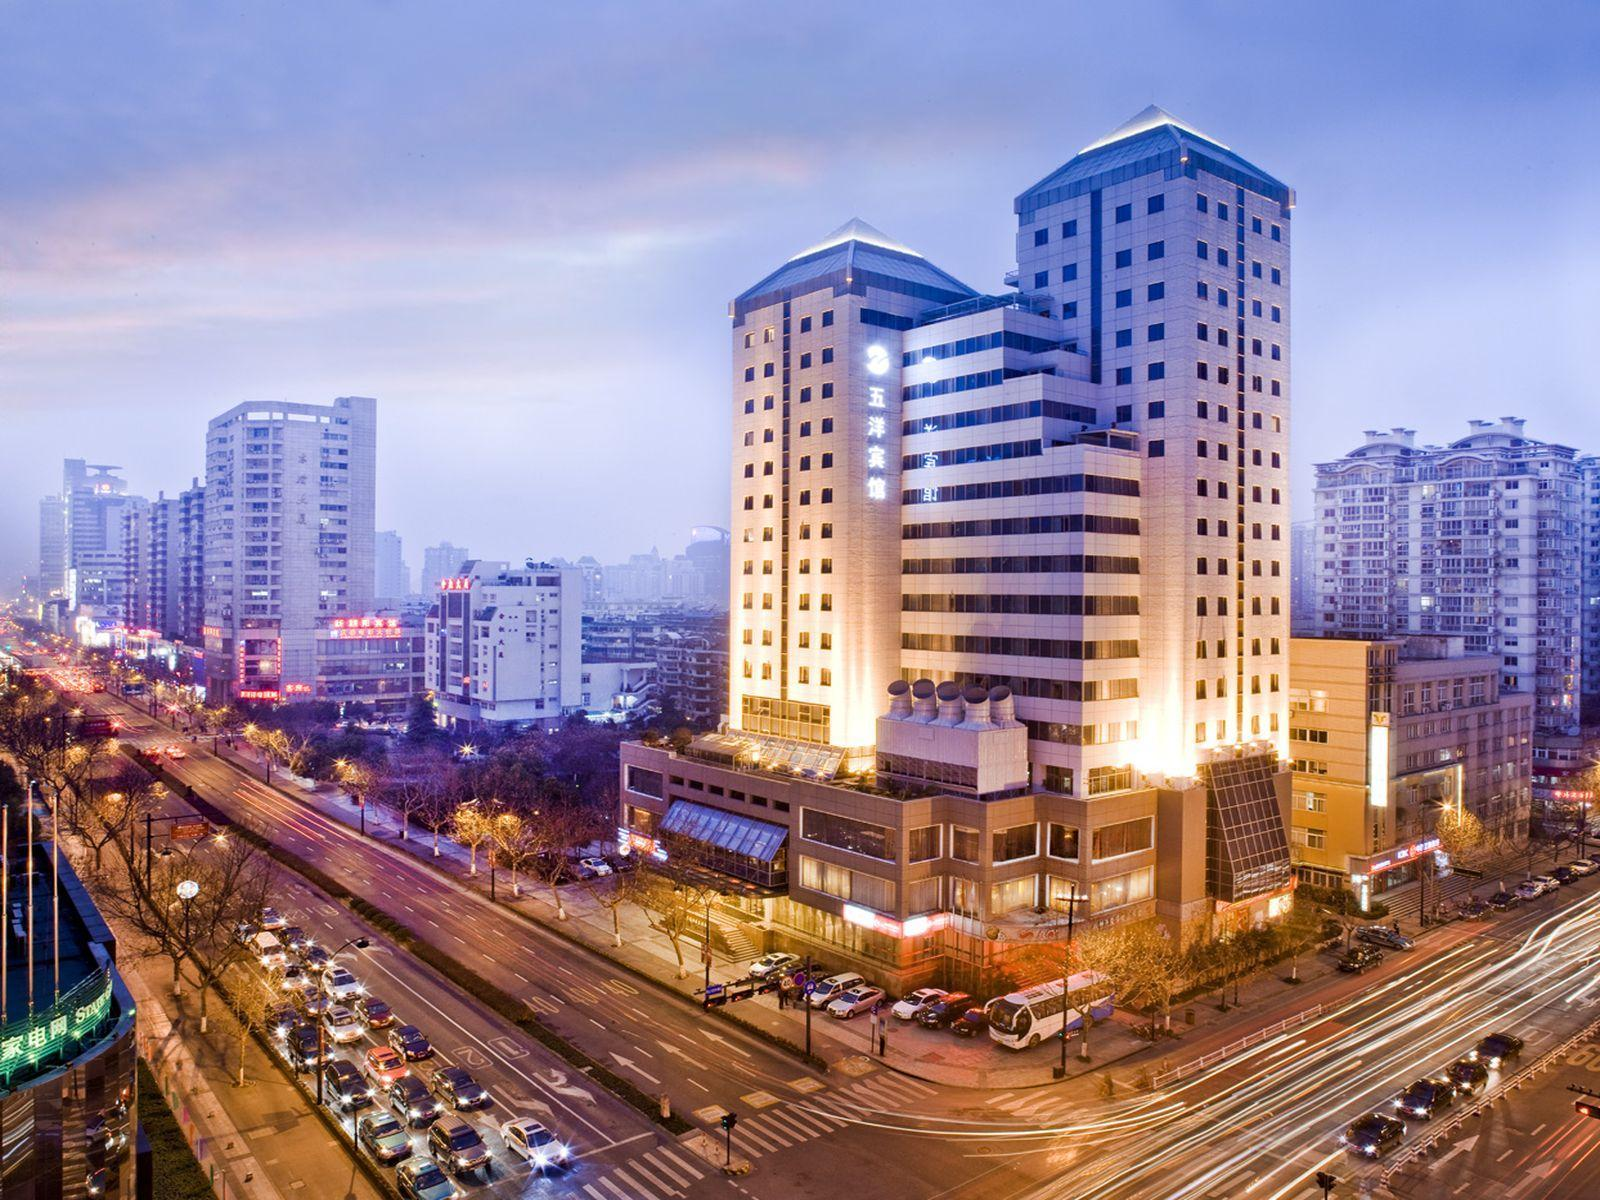 Wu Yang Hotel